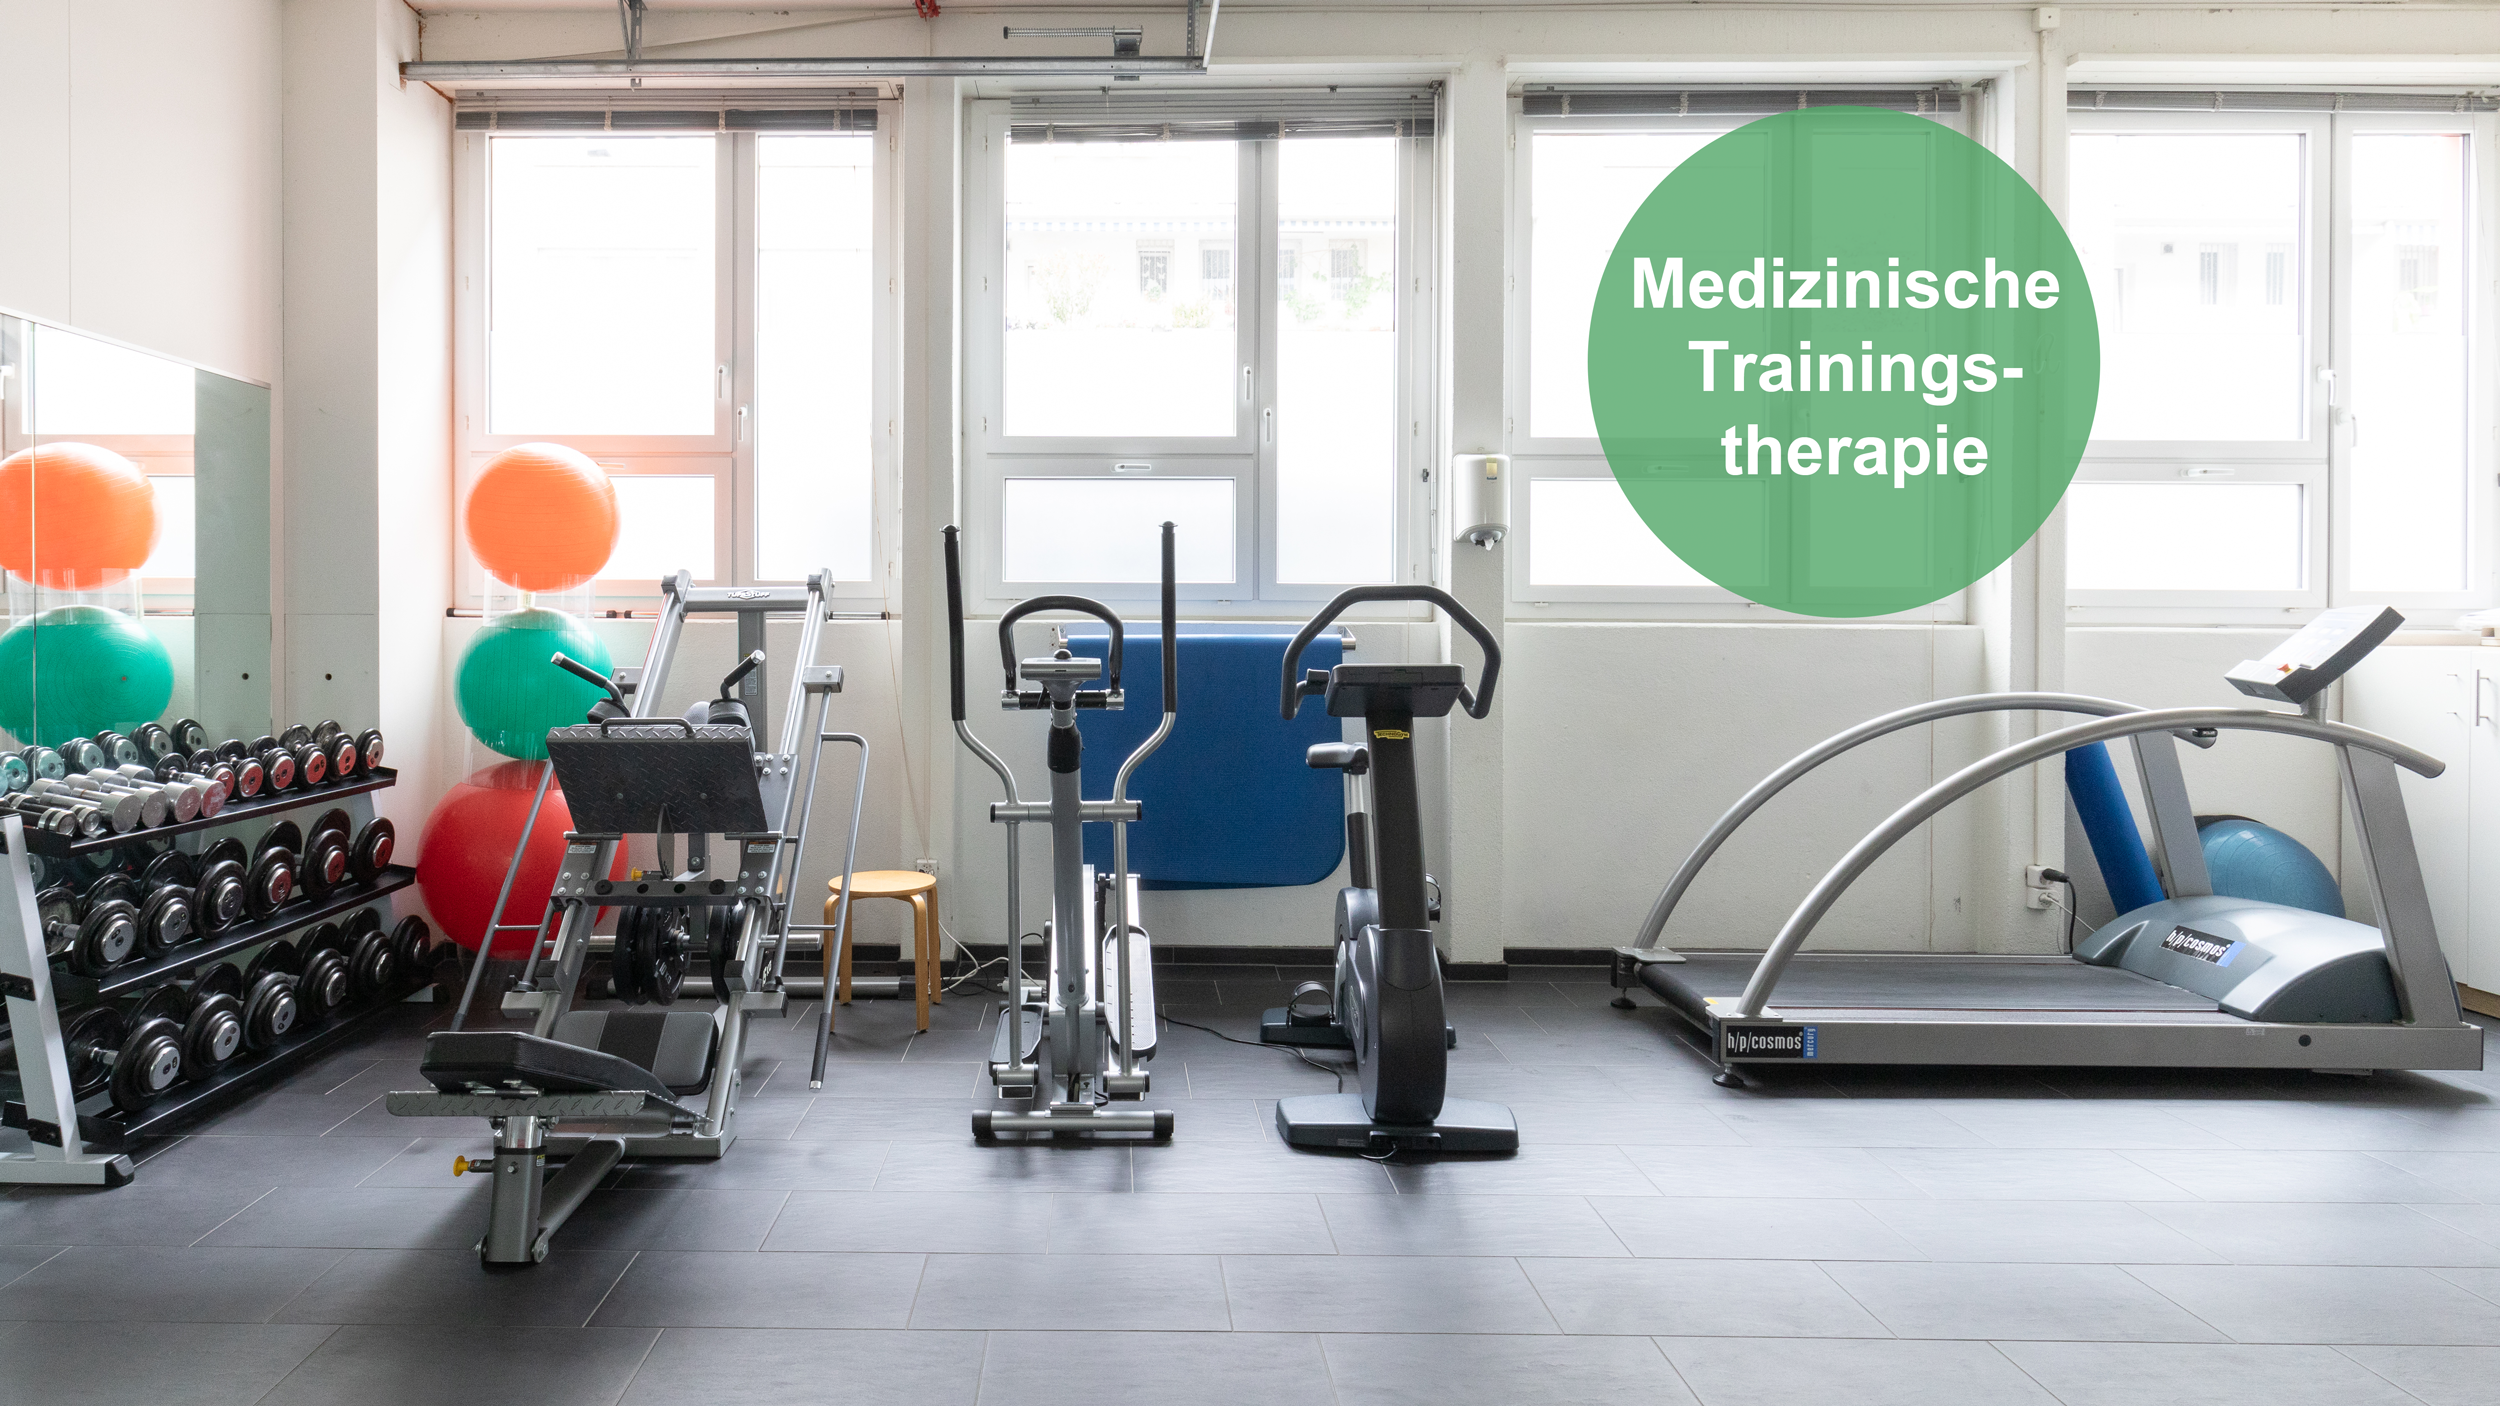 Medizinische Trainingstherapie Therapie Brunner & Bonesso